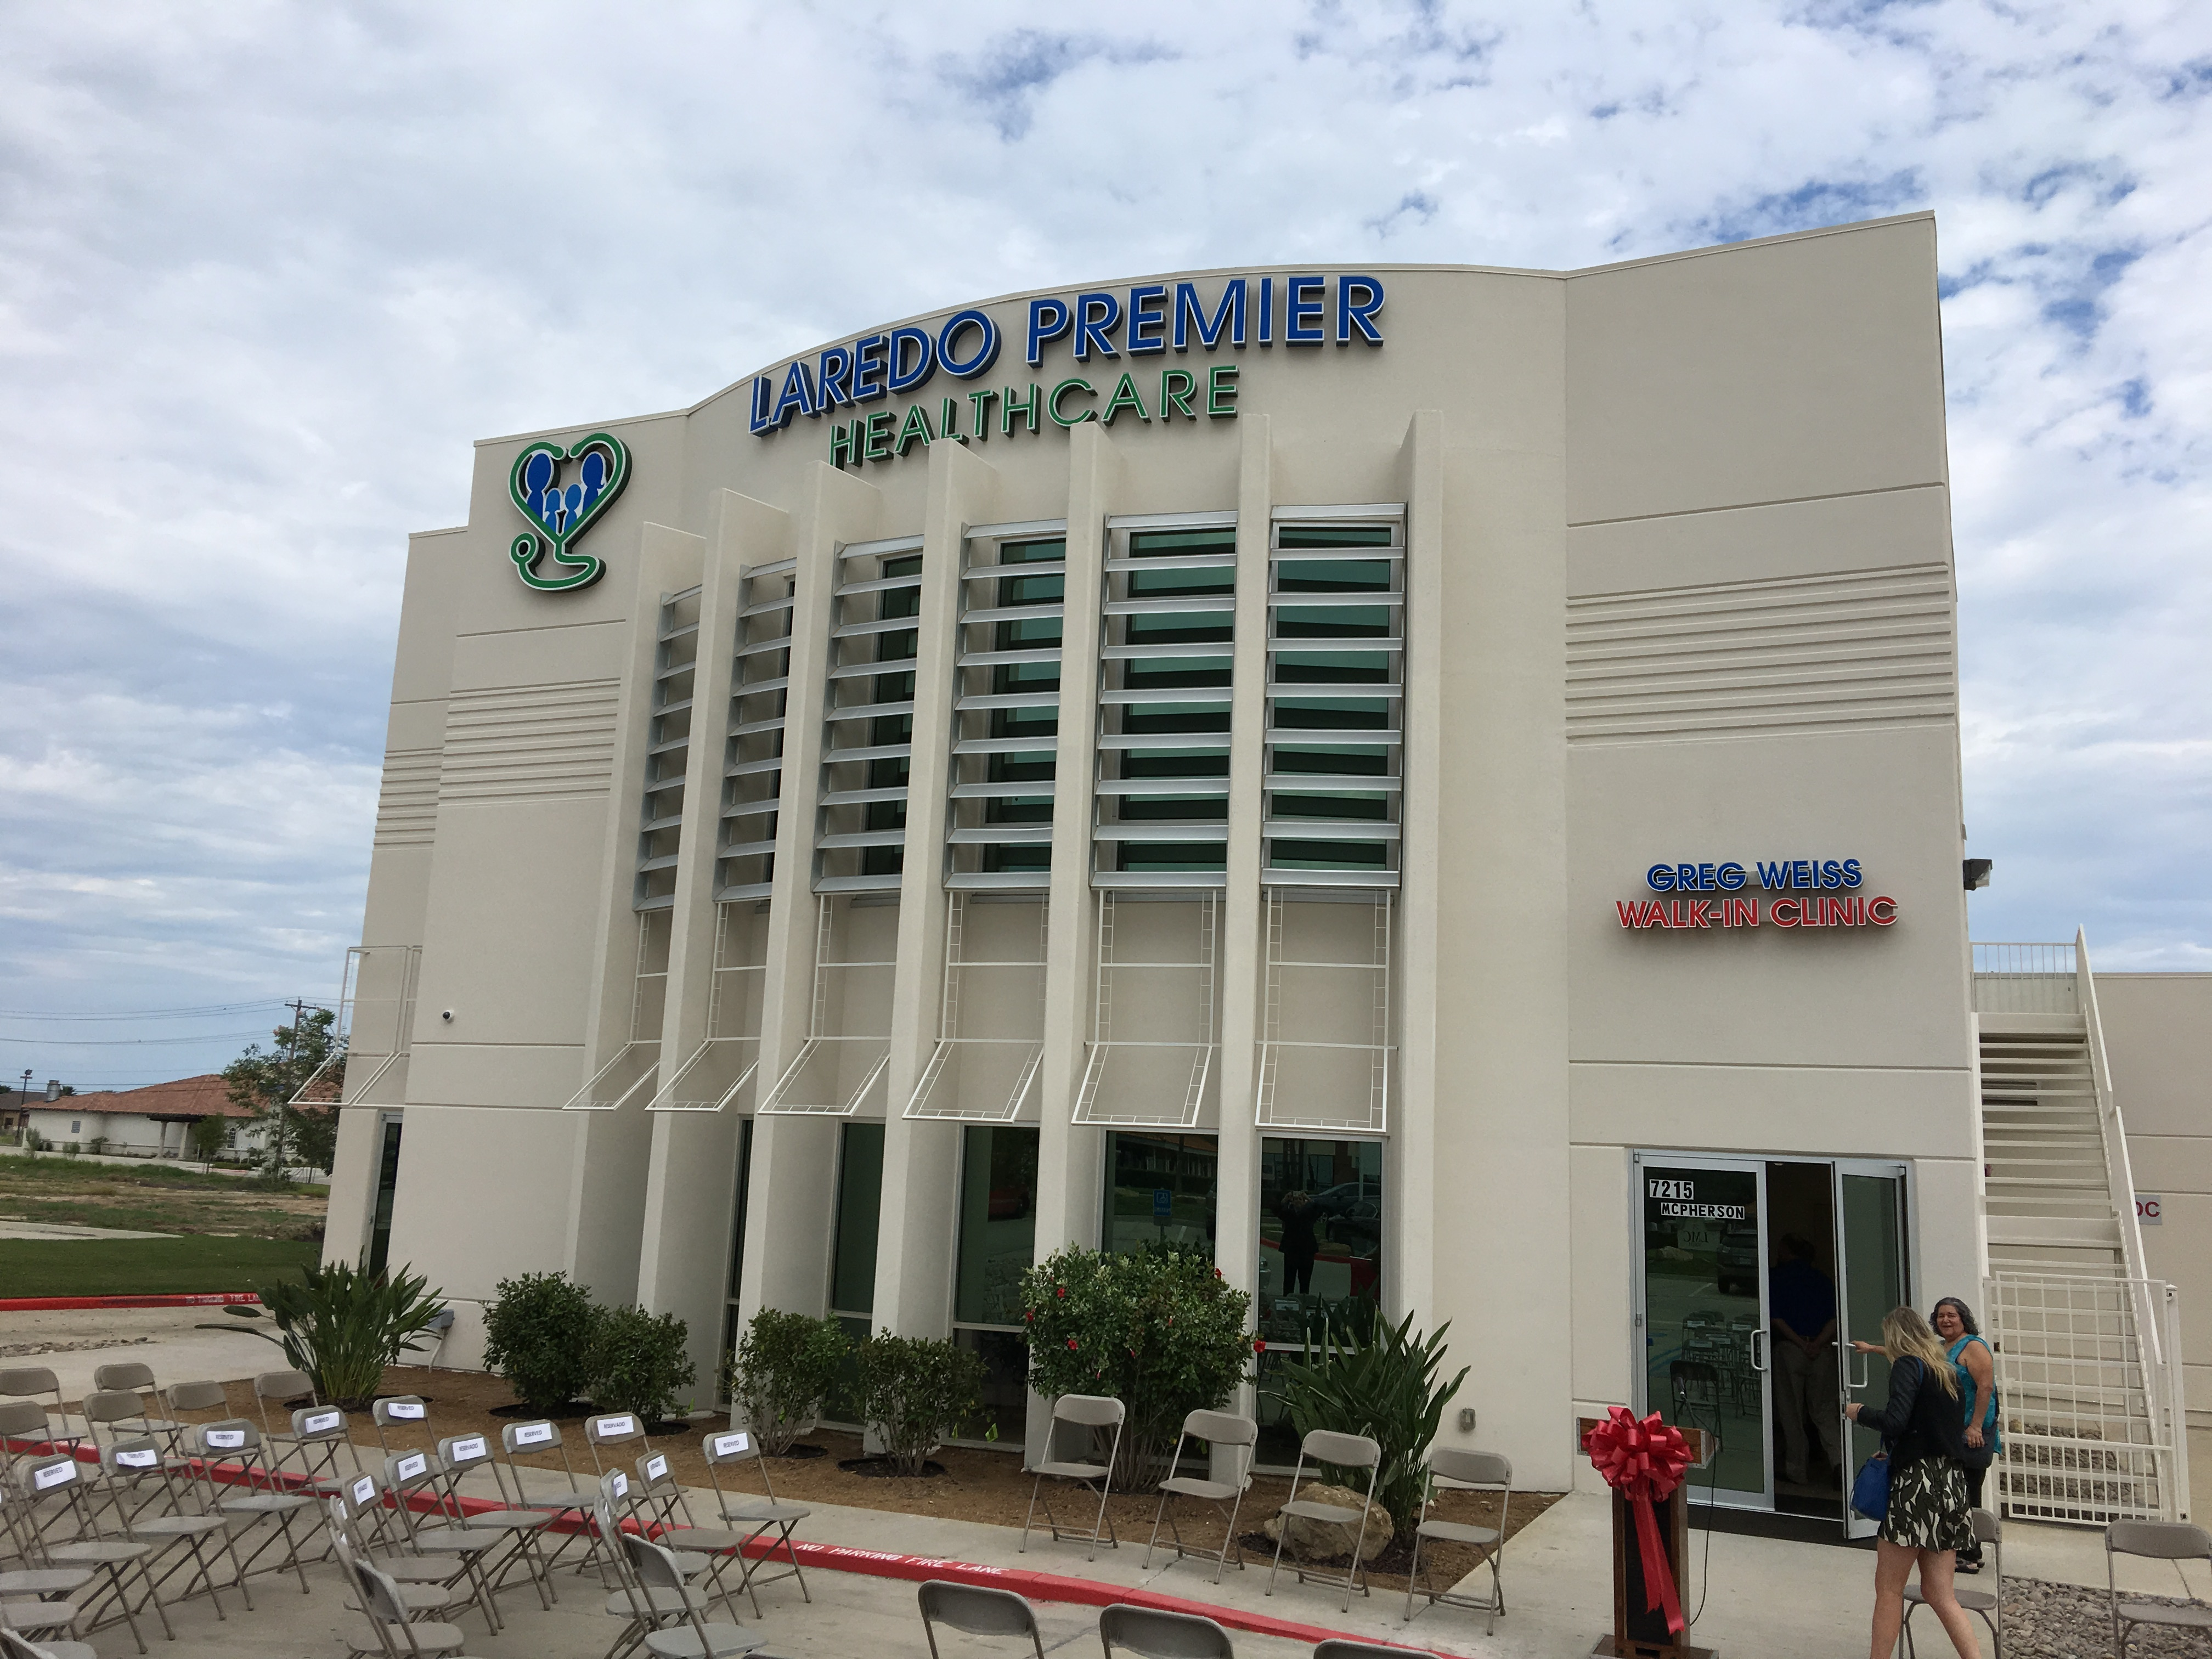 Laredo Premier Healthcare